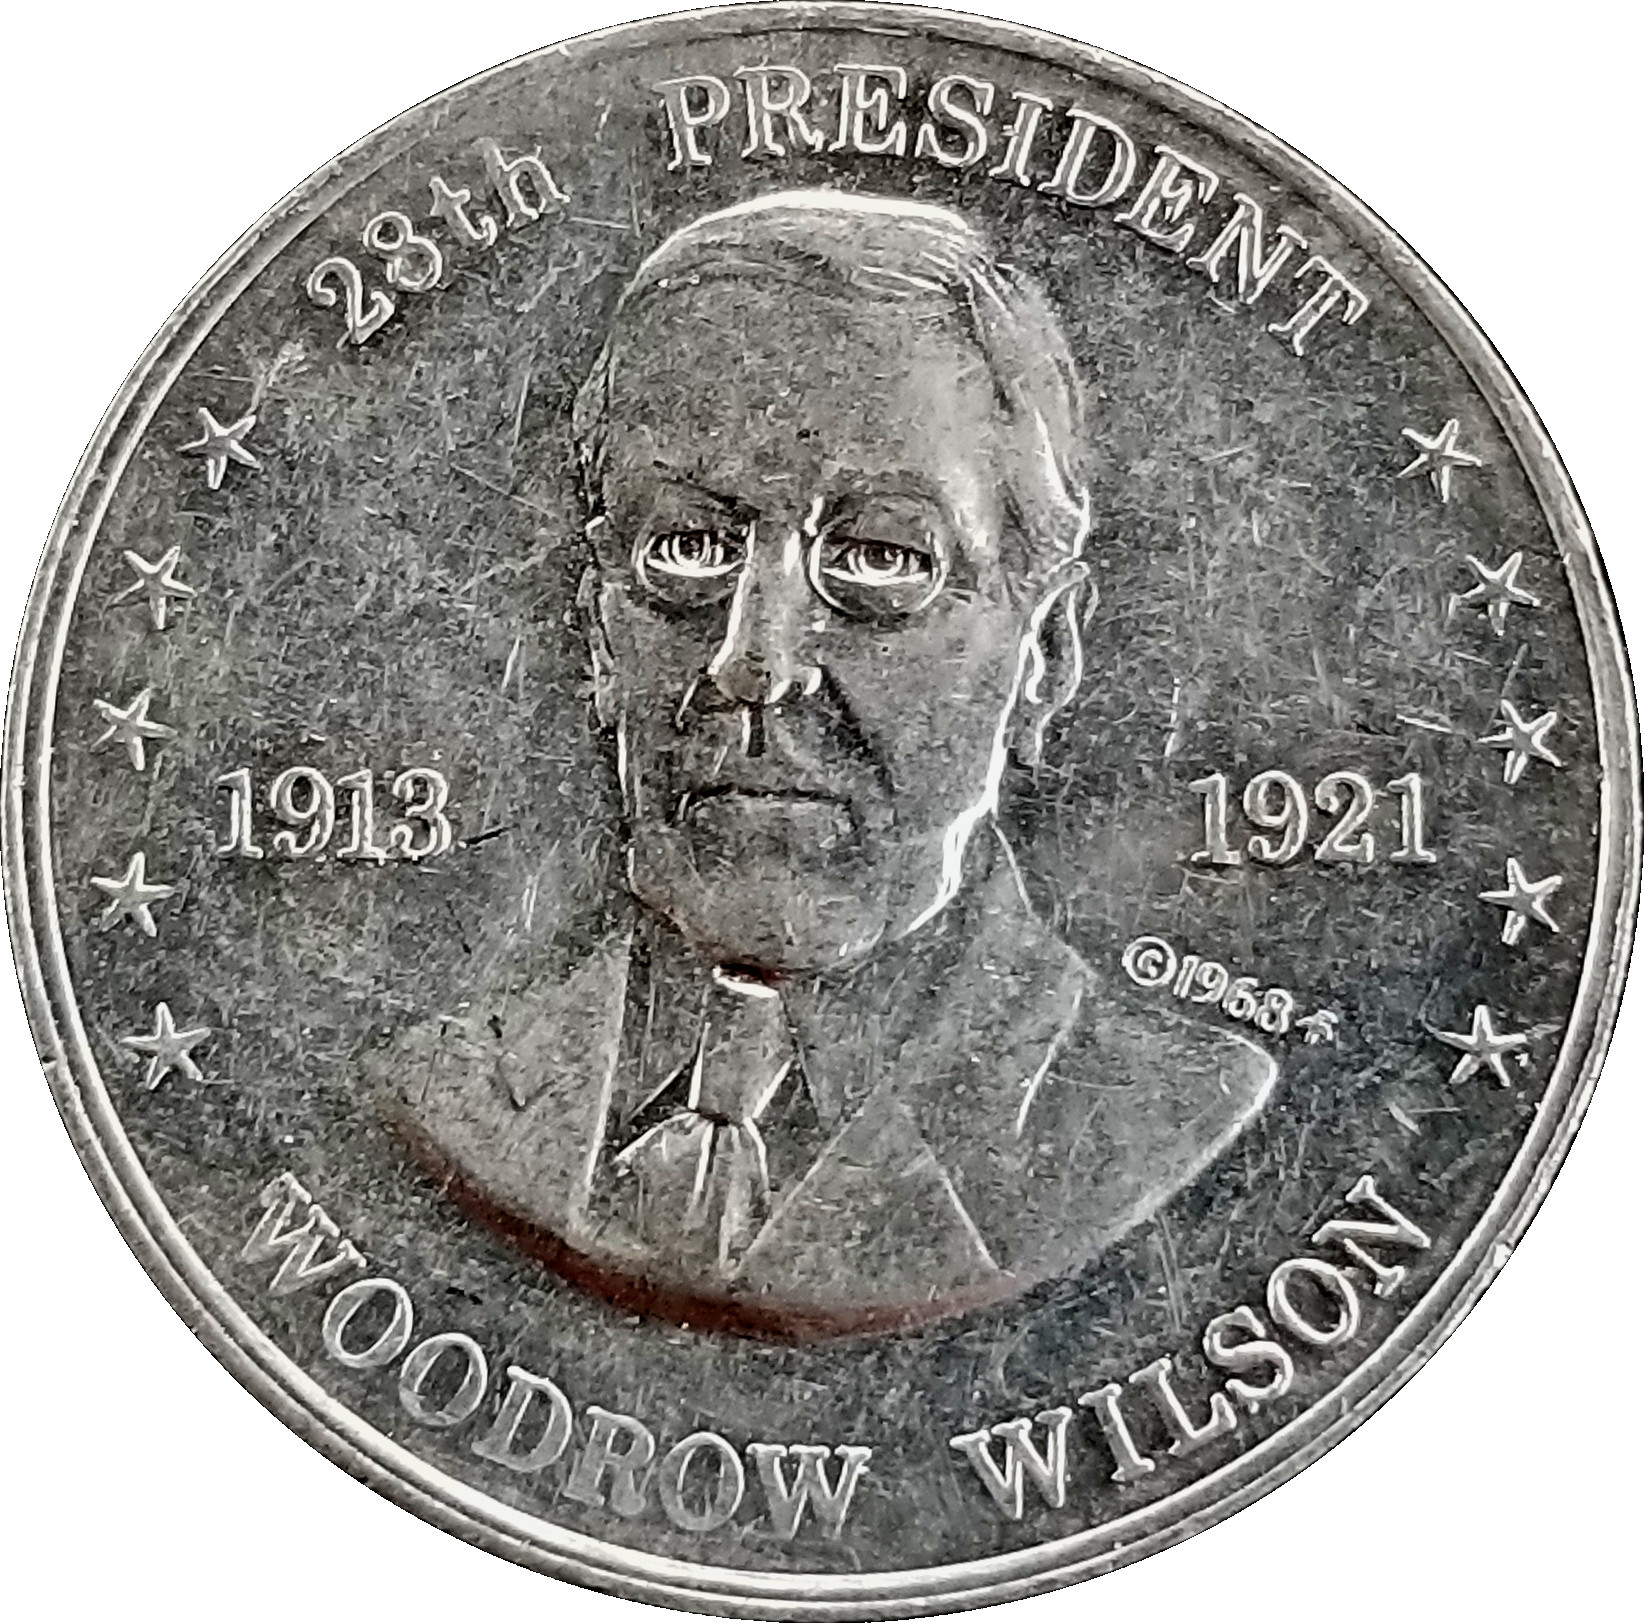 shells mr president coin game